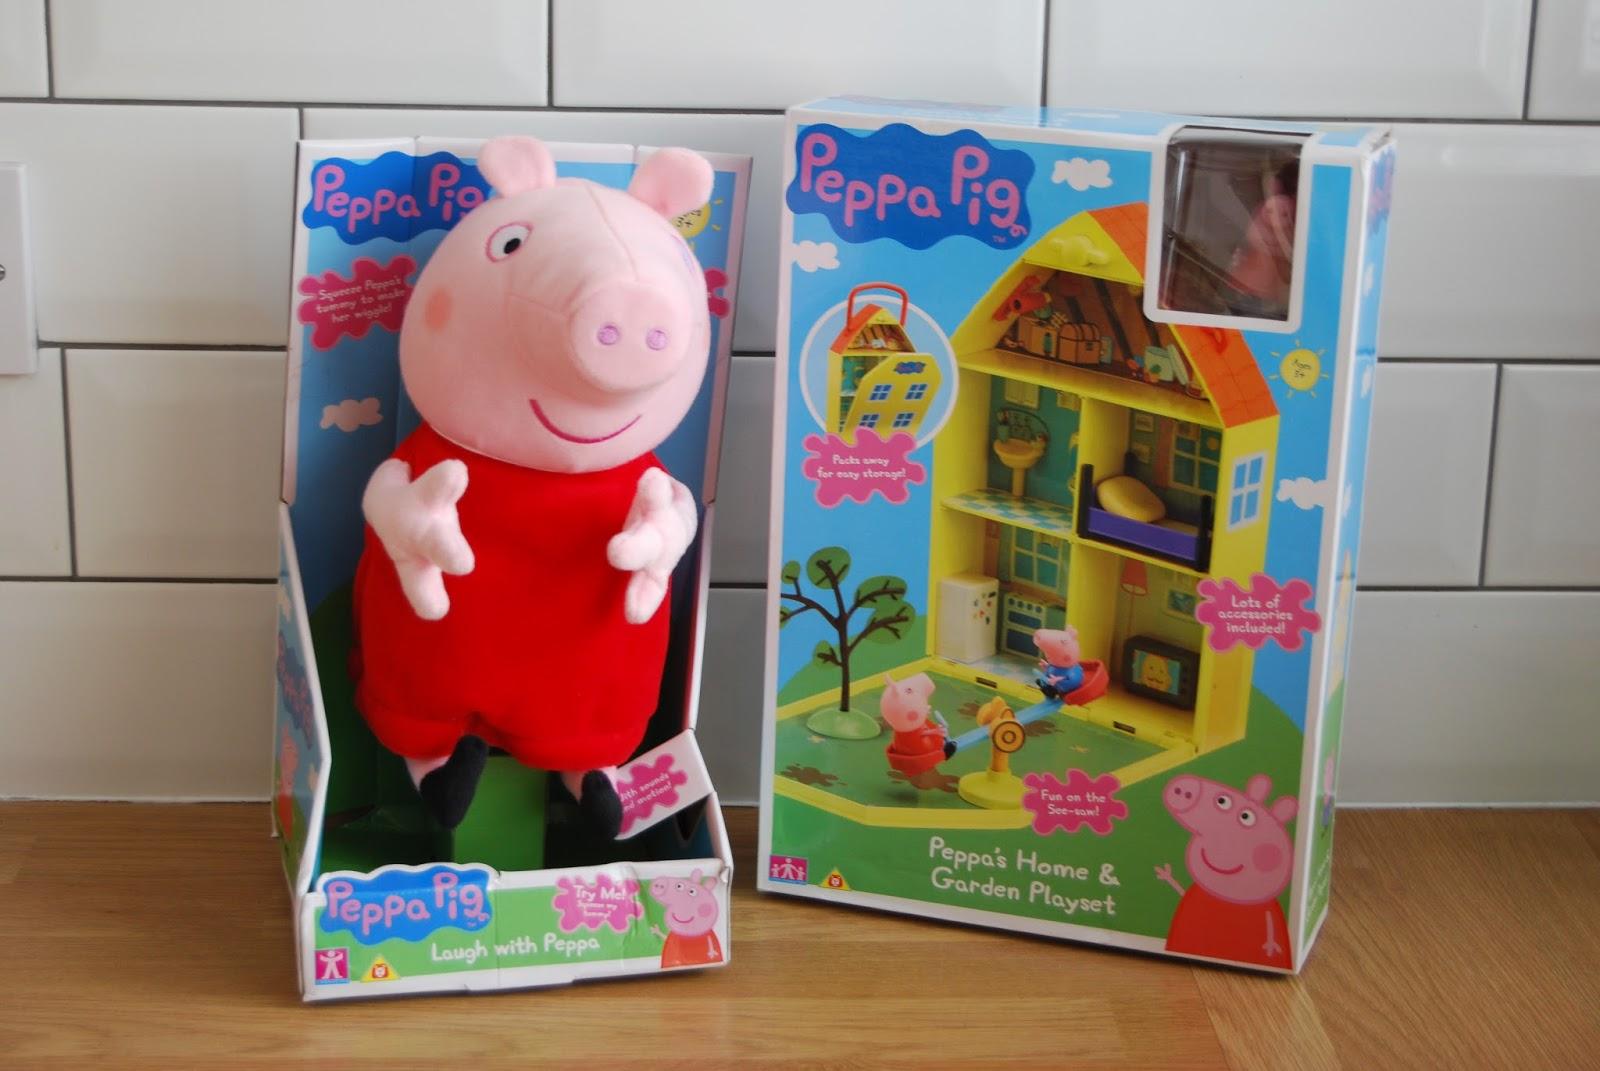 Chic Geek Diary: Peppa Pig Classic Toy Range